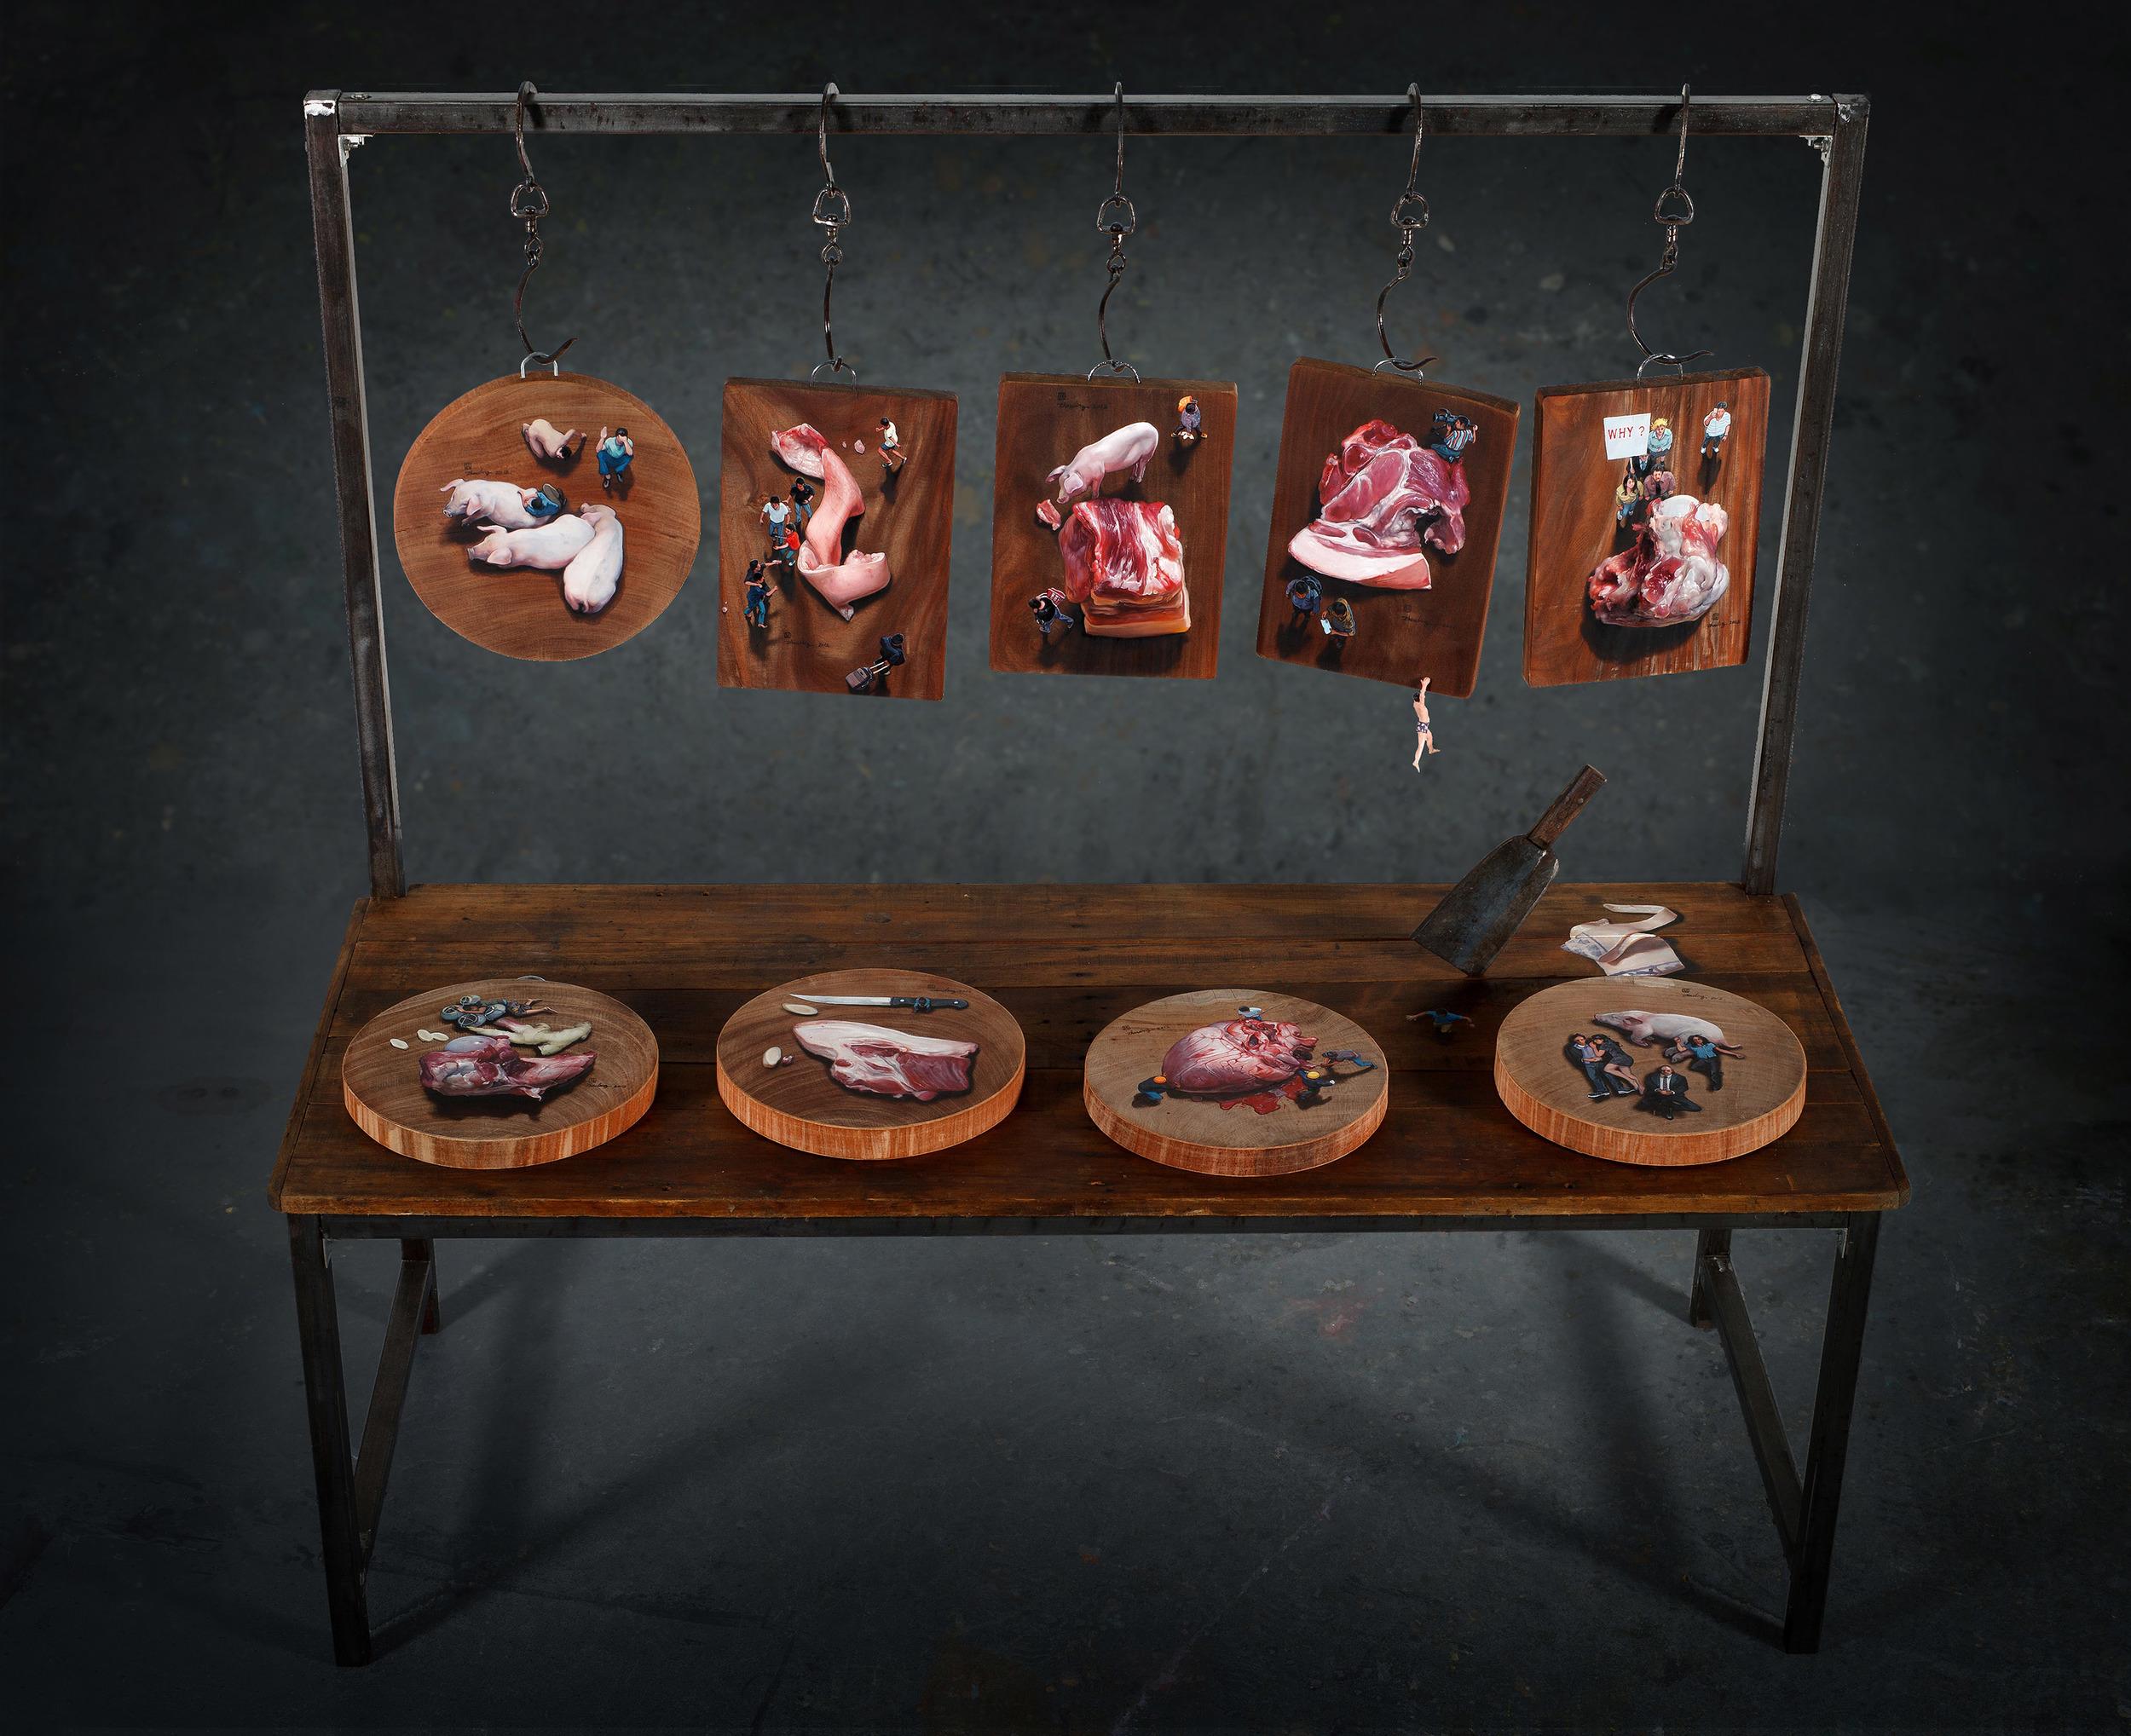 Zhou Jinhua 周金华, Chopping block 肉案, 2012, Painting Installation 绘画装置, 190 x 180 x 76 cm